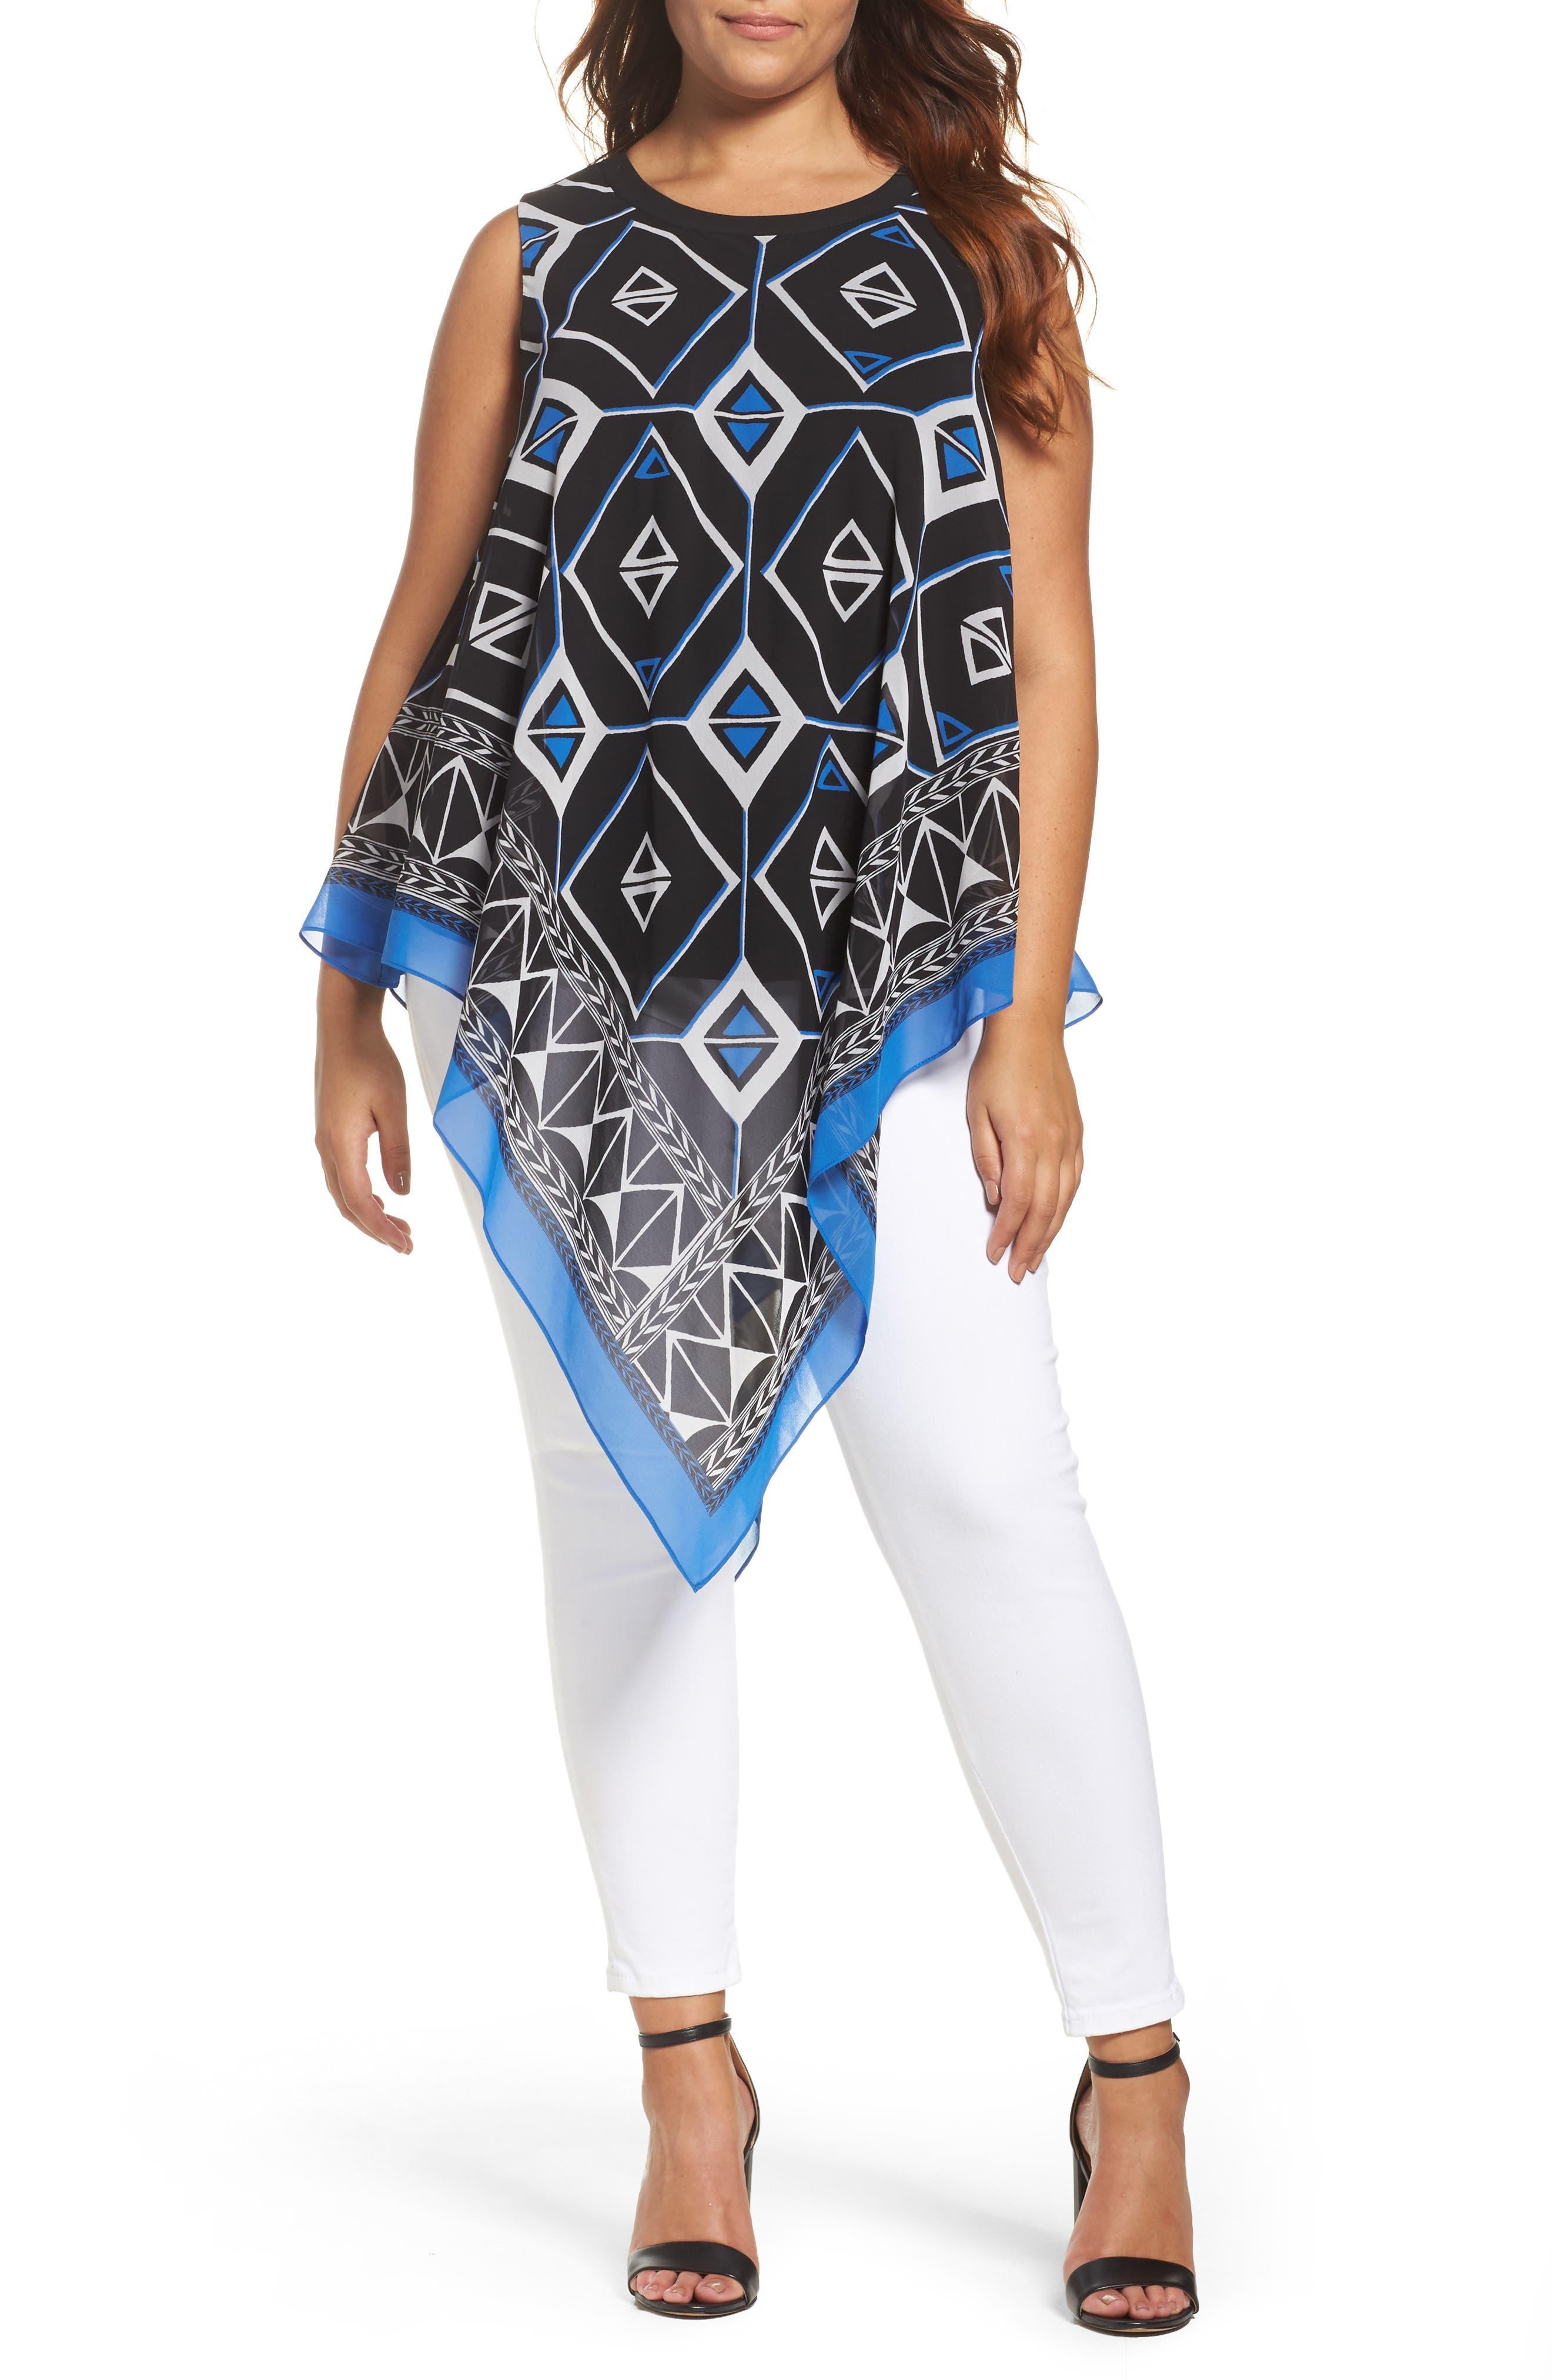 Alternate Image 1 Selected - Vince Camuto Graphic Chiffon Handkerchief Blouse (Plus Size)